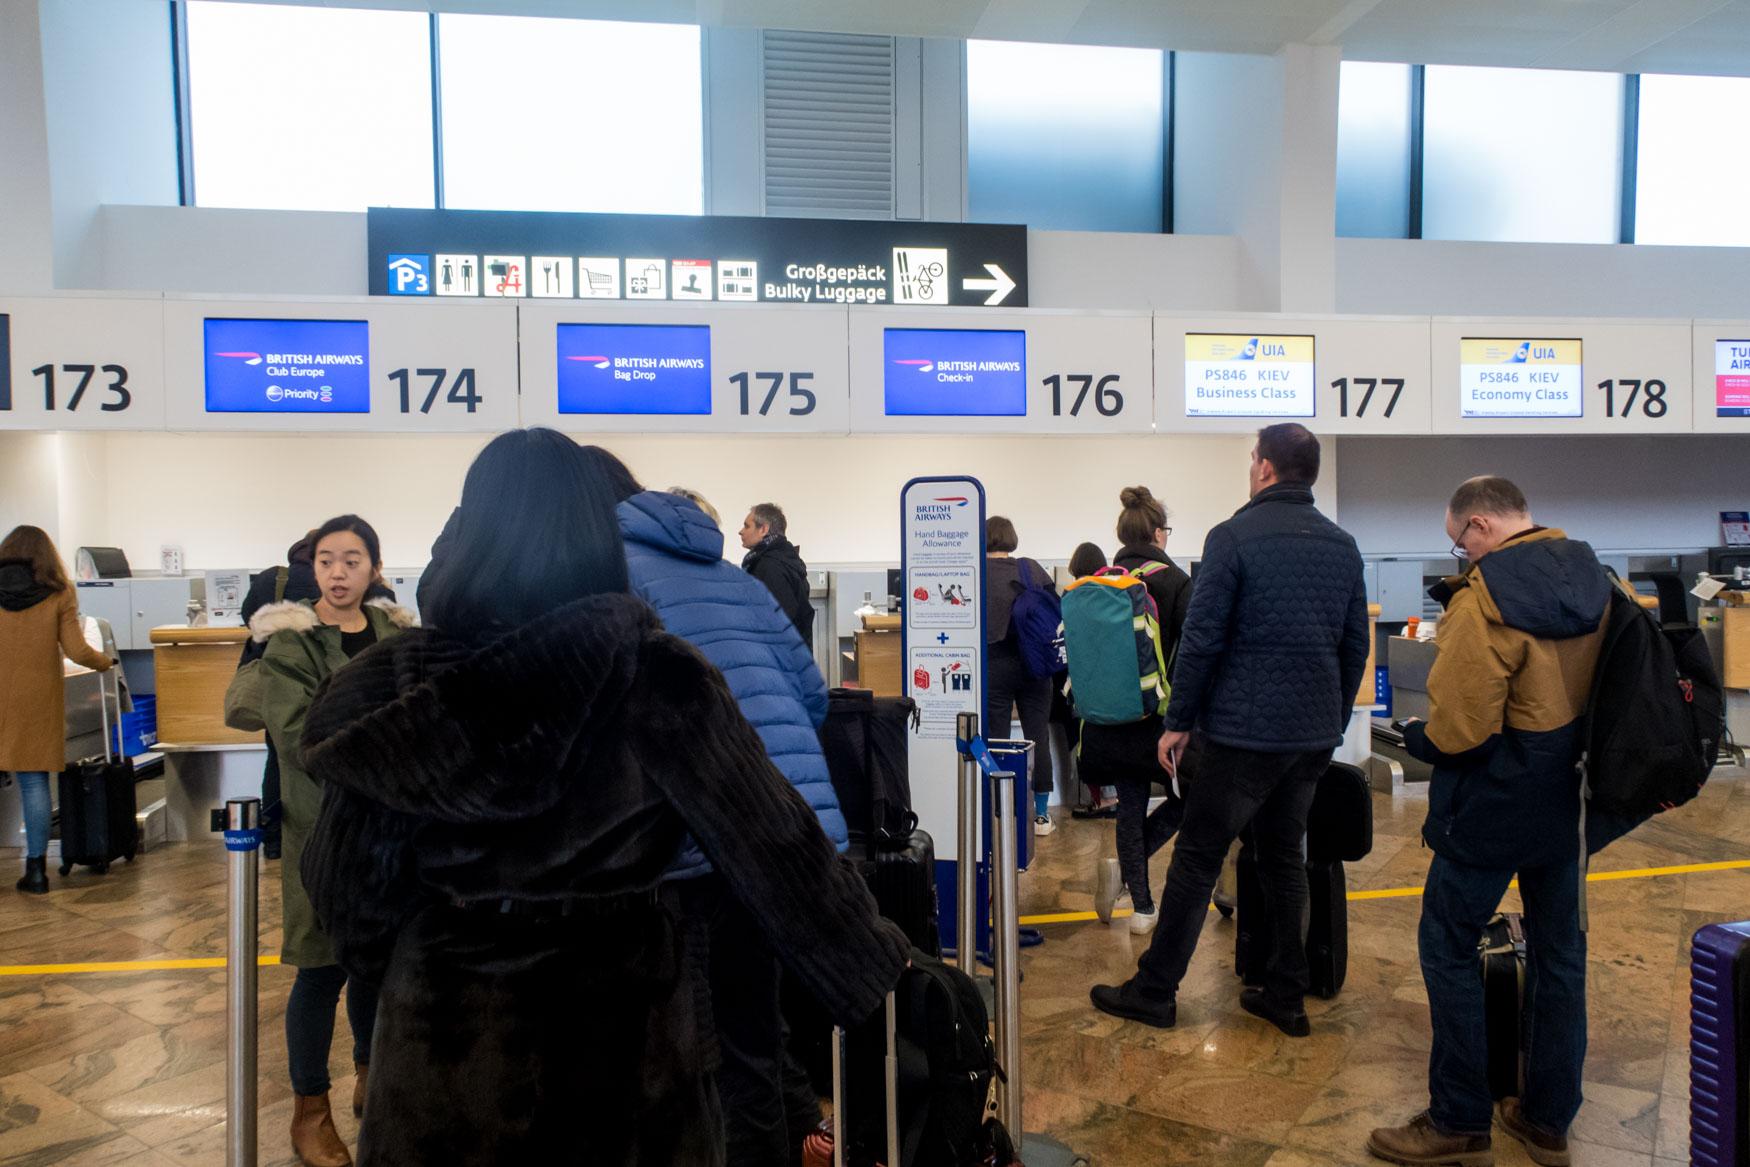 British Airways Check-in Counters at Vienna Airport